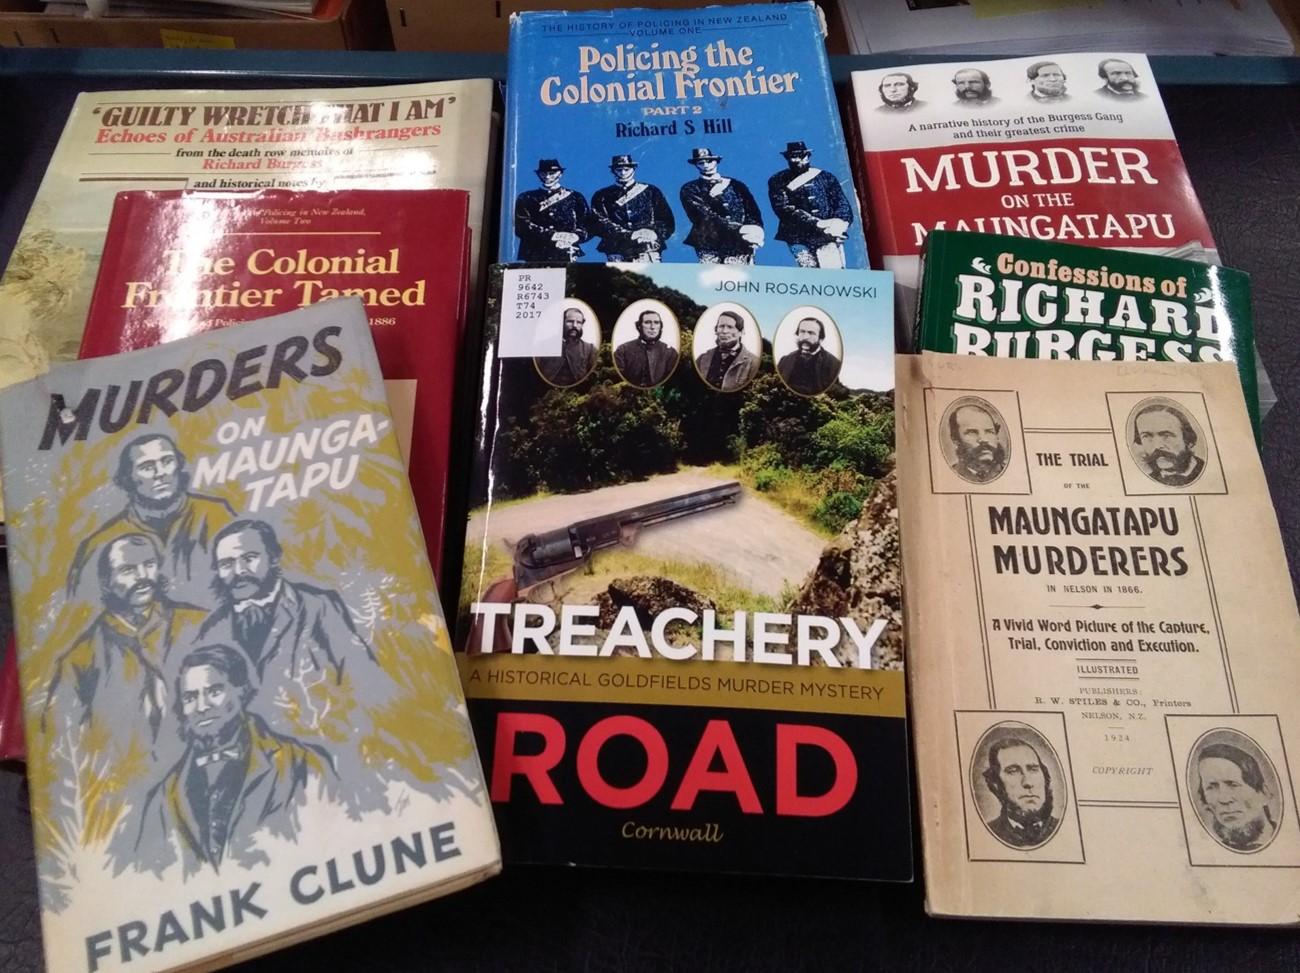 Murder on the Maungatapu – The Hocken Blog, University of